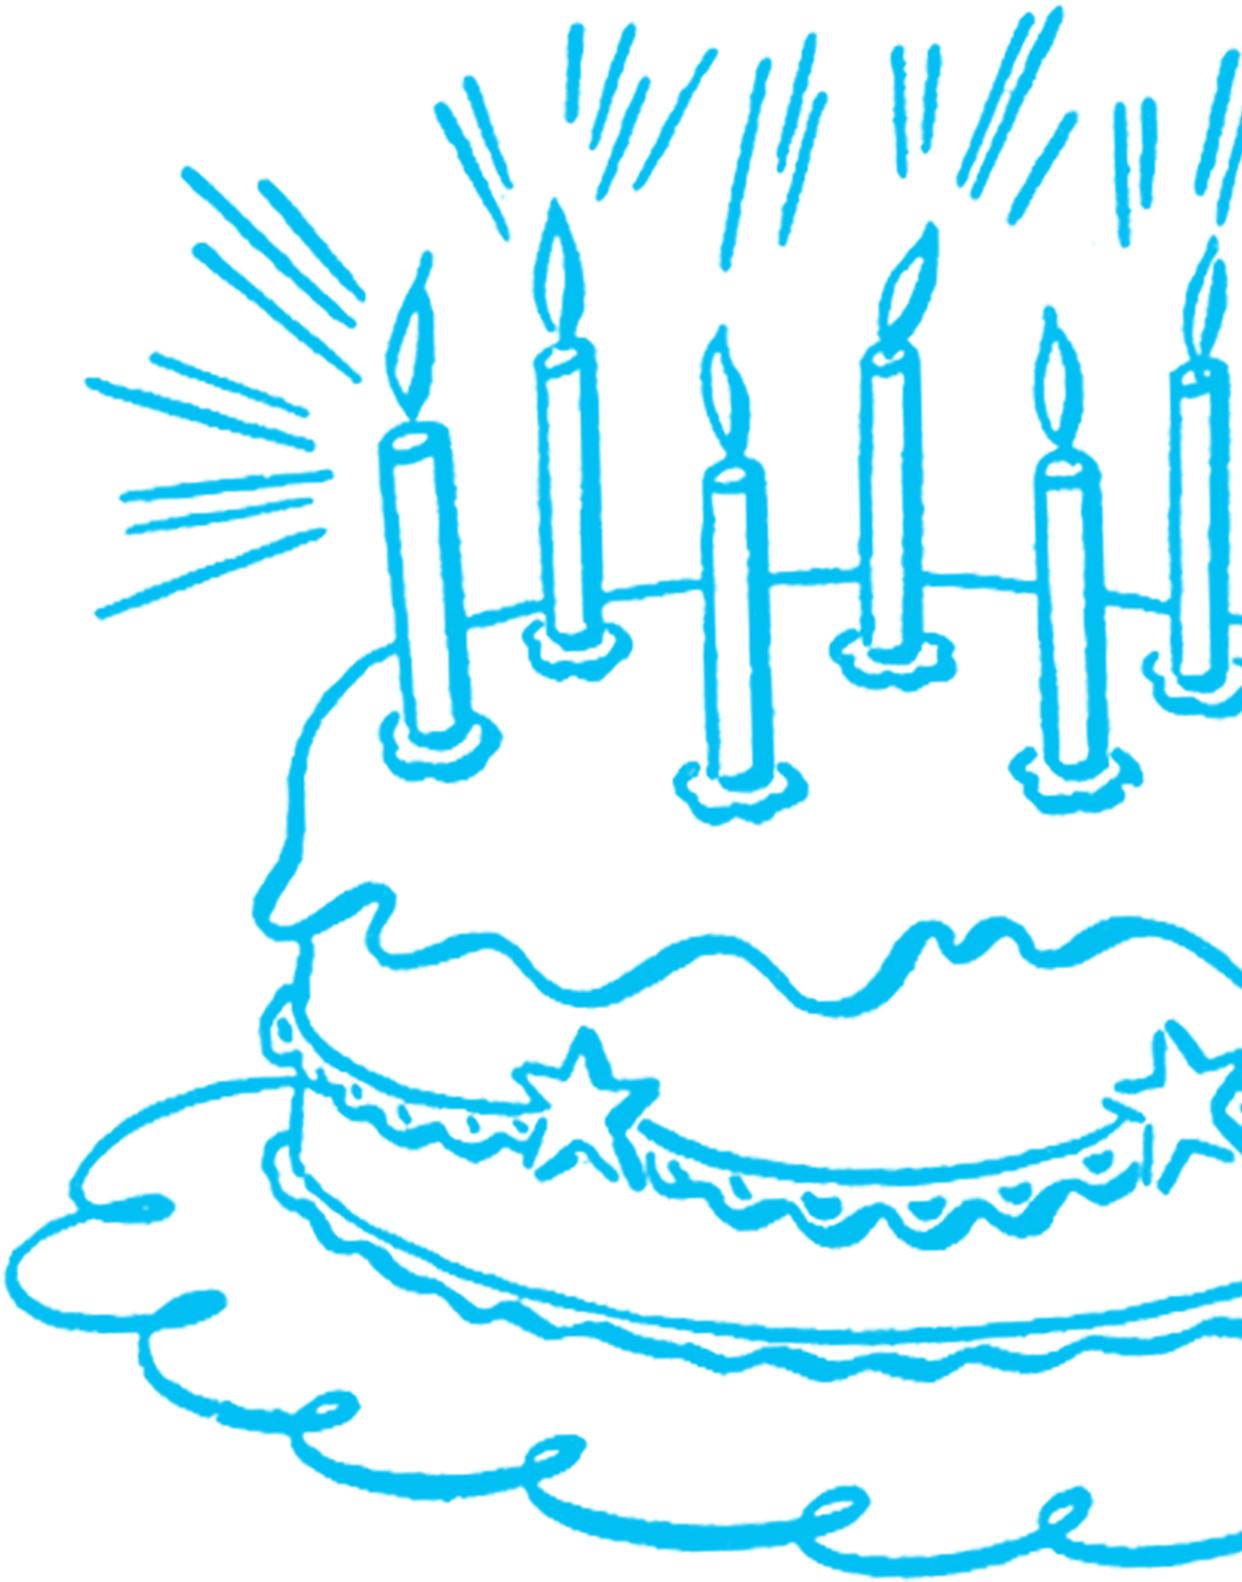 Vintage Birthday Cake Line Art The Graphics Fairy